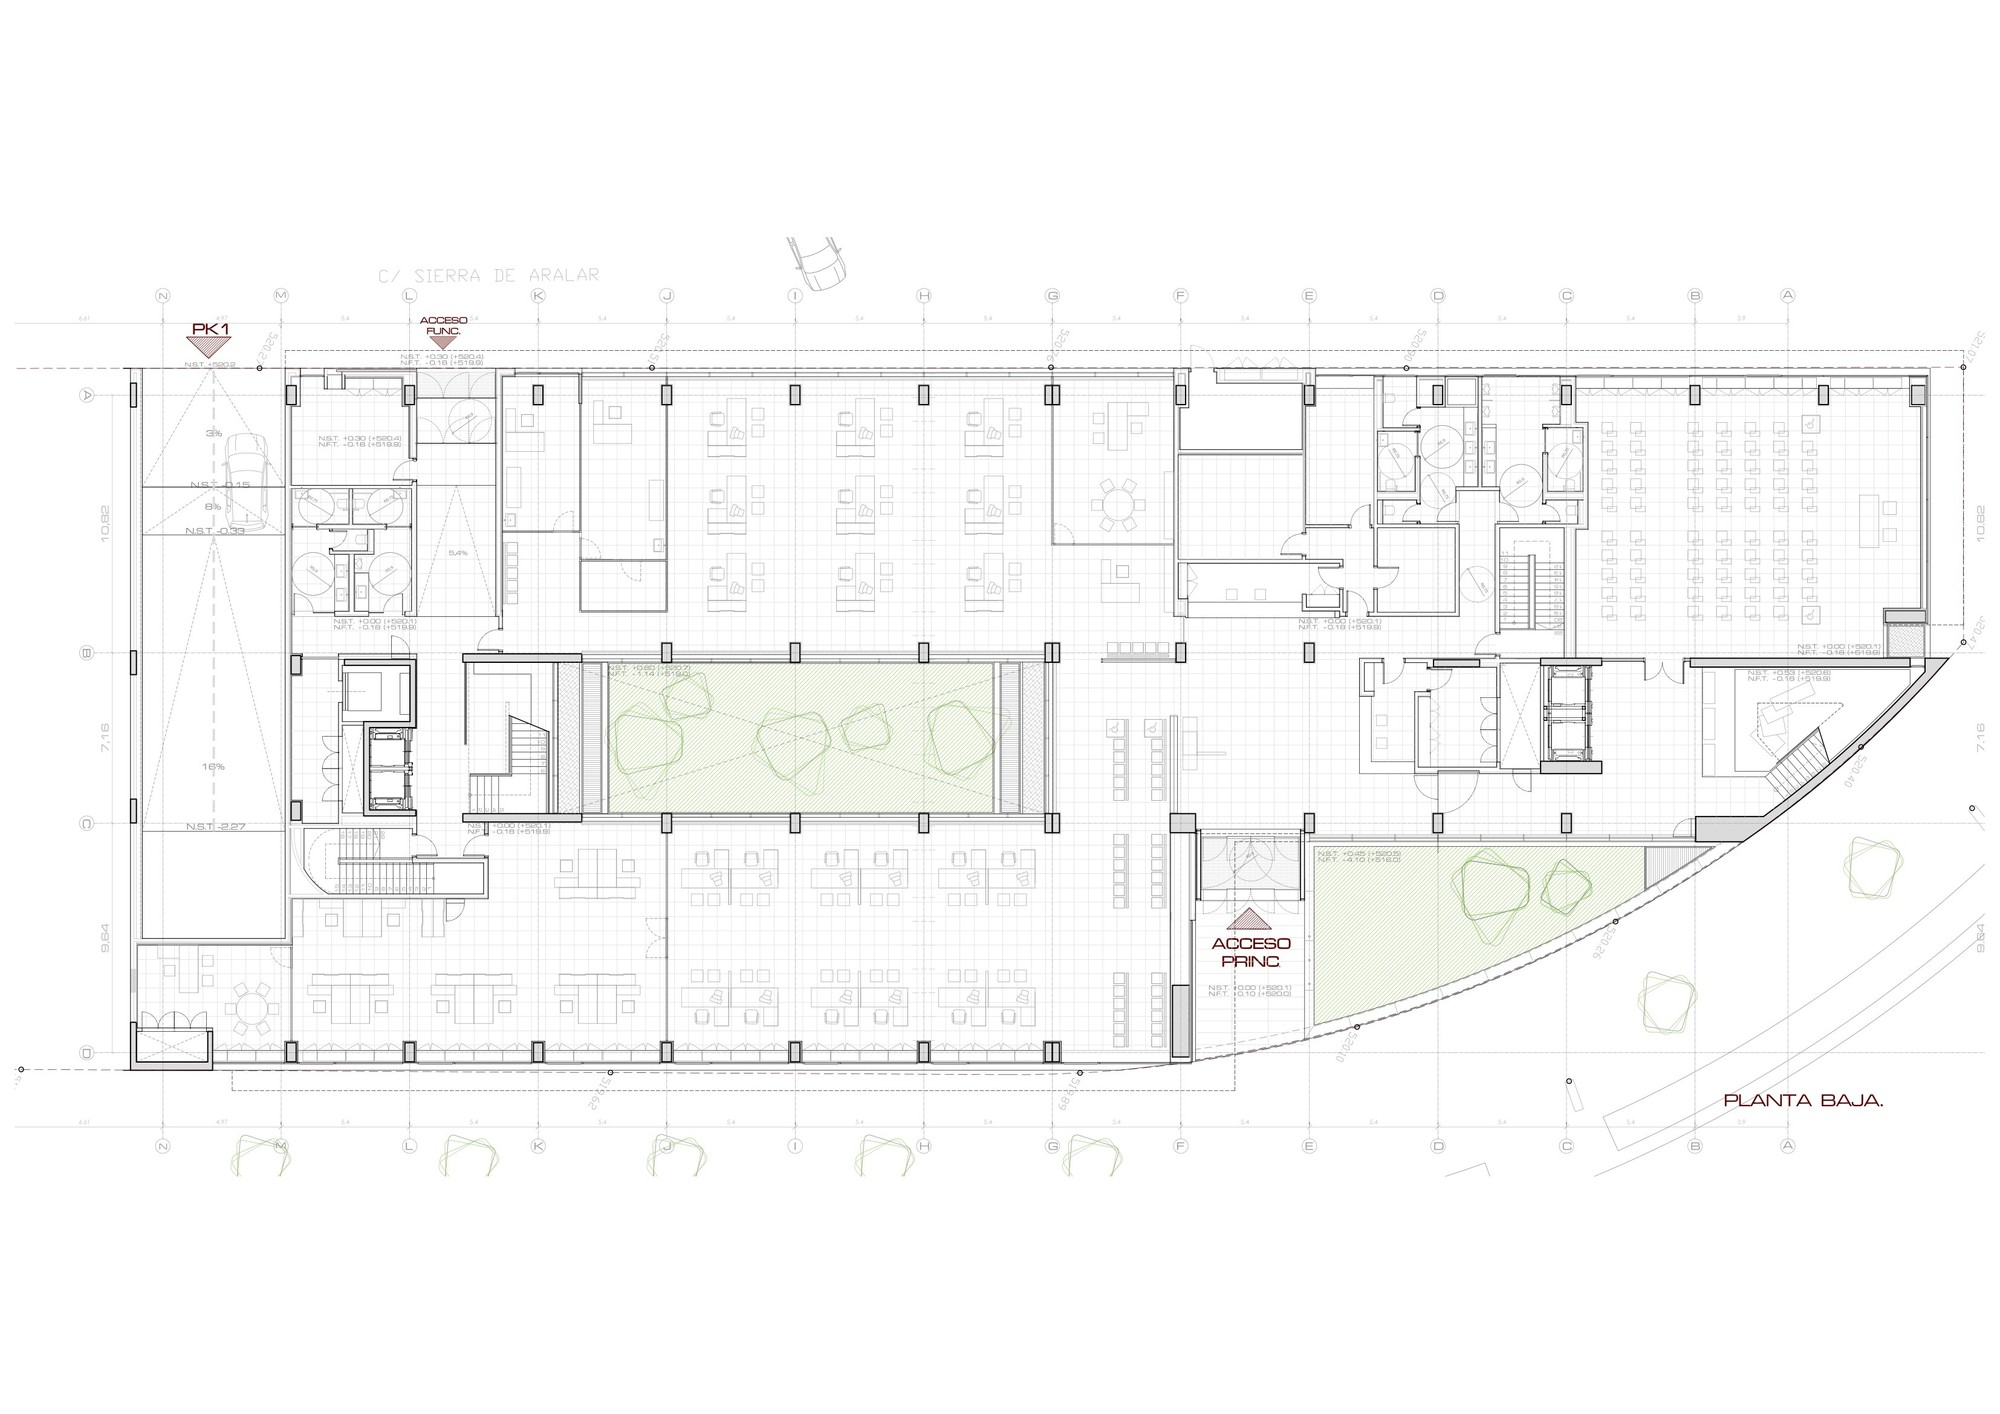 Galer a de edificio de oficinas en vitoria lh14 arquitectos 14 - Arquitectos en vitoria ...